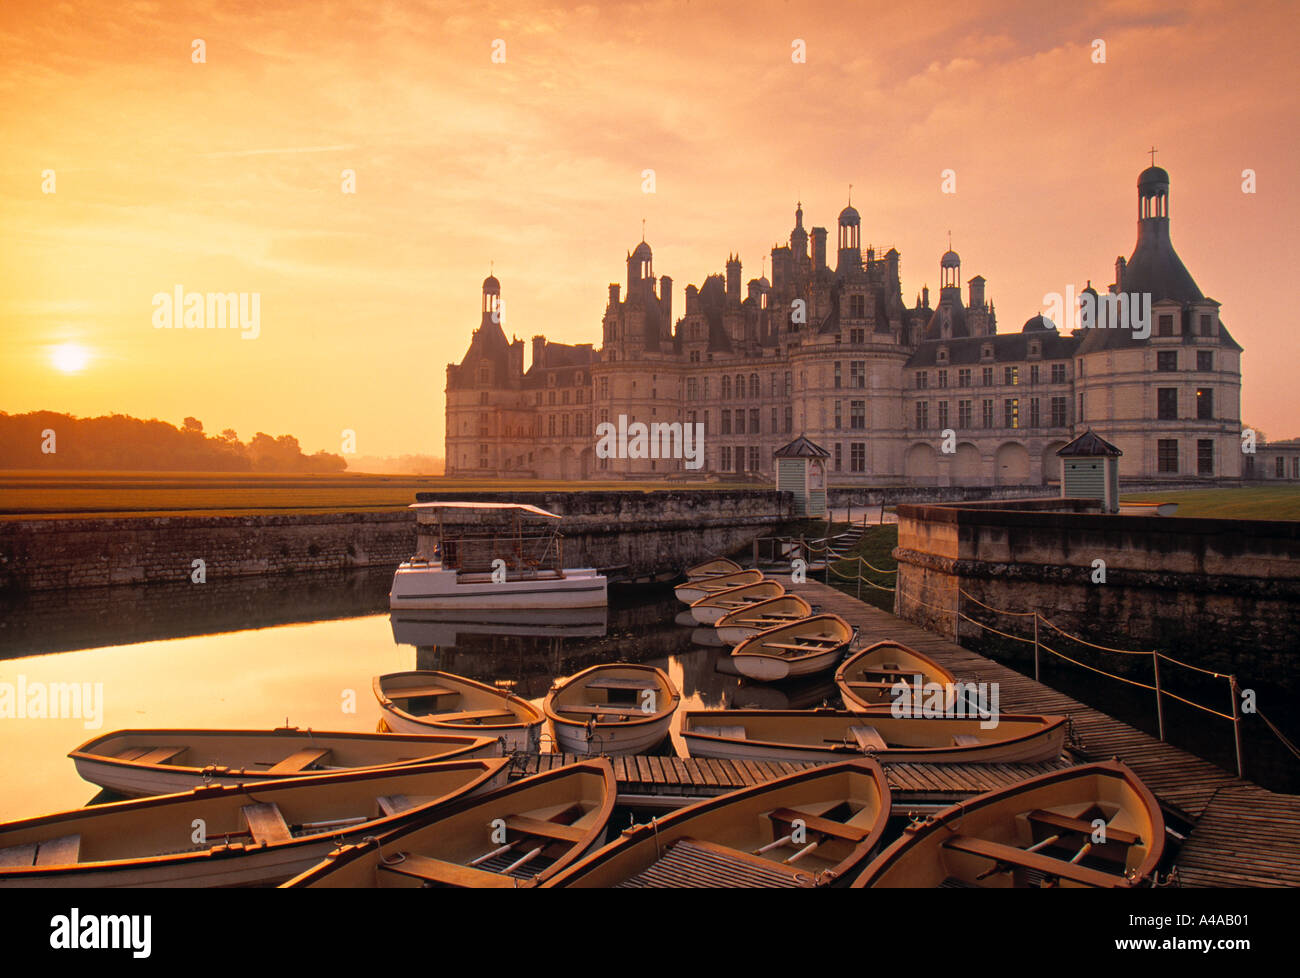 Chateau de Chambord, Loire Valley, France - Stock Image